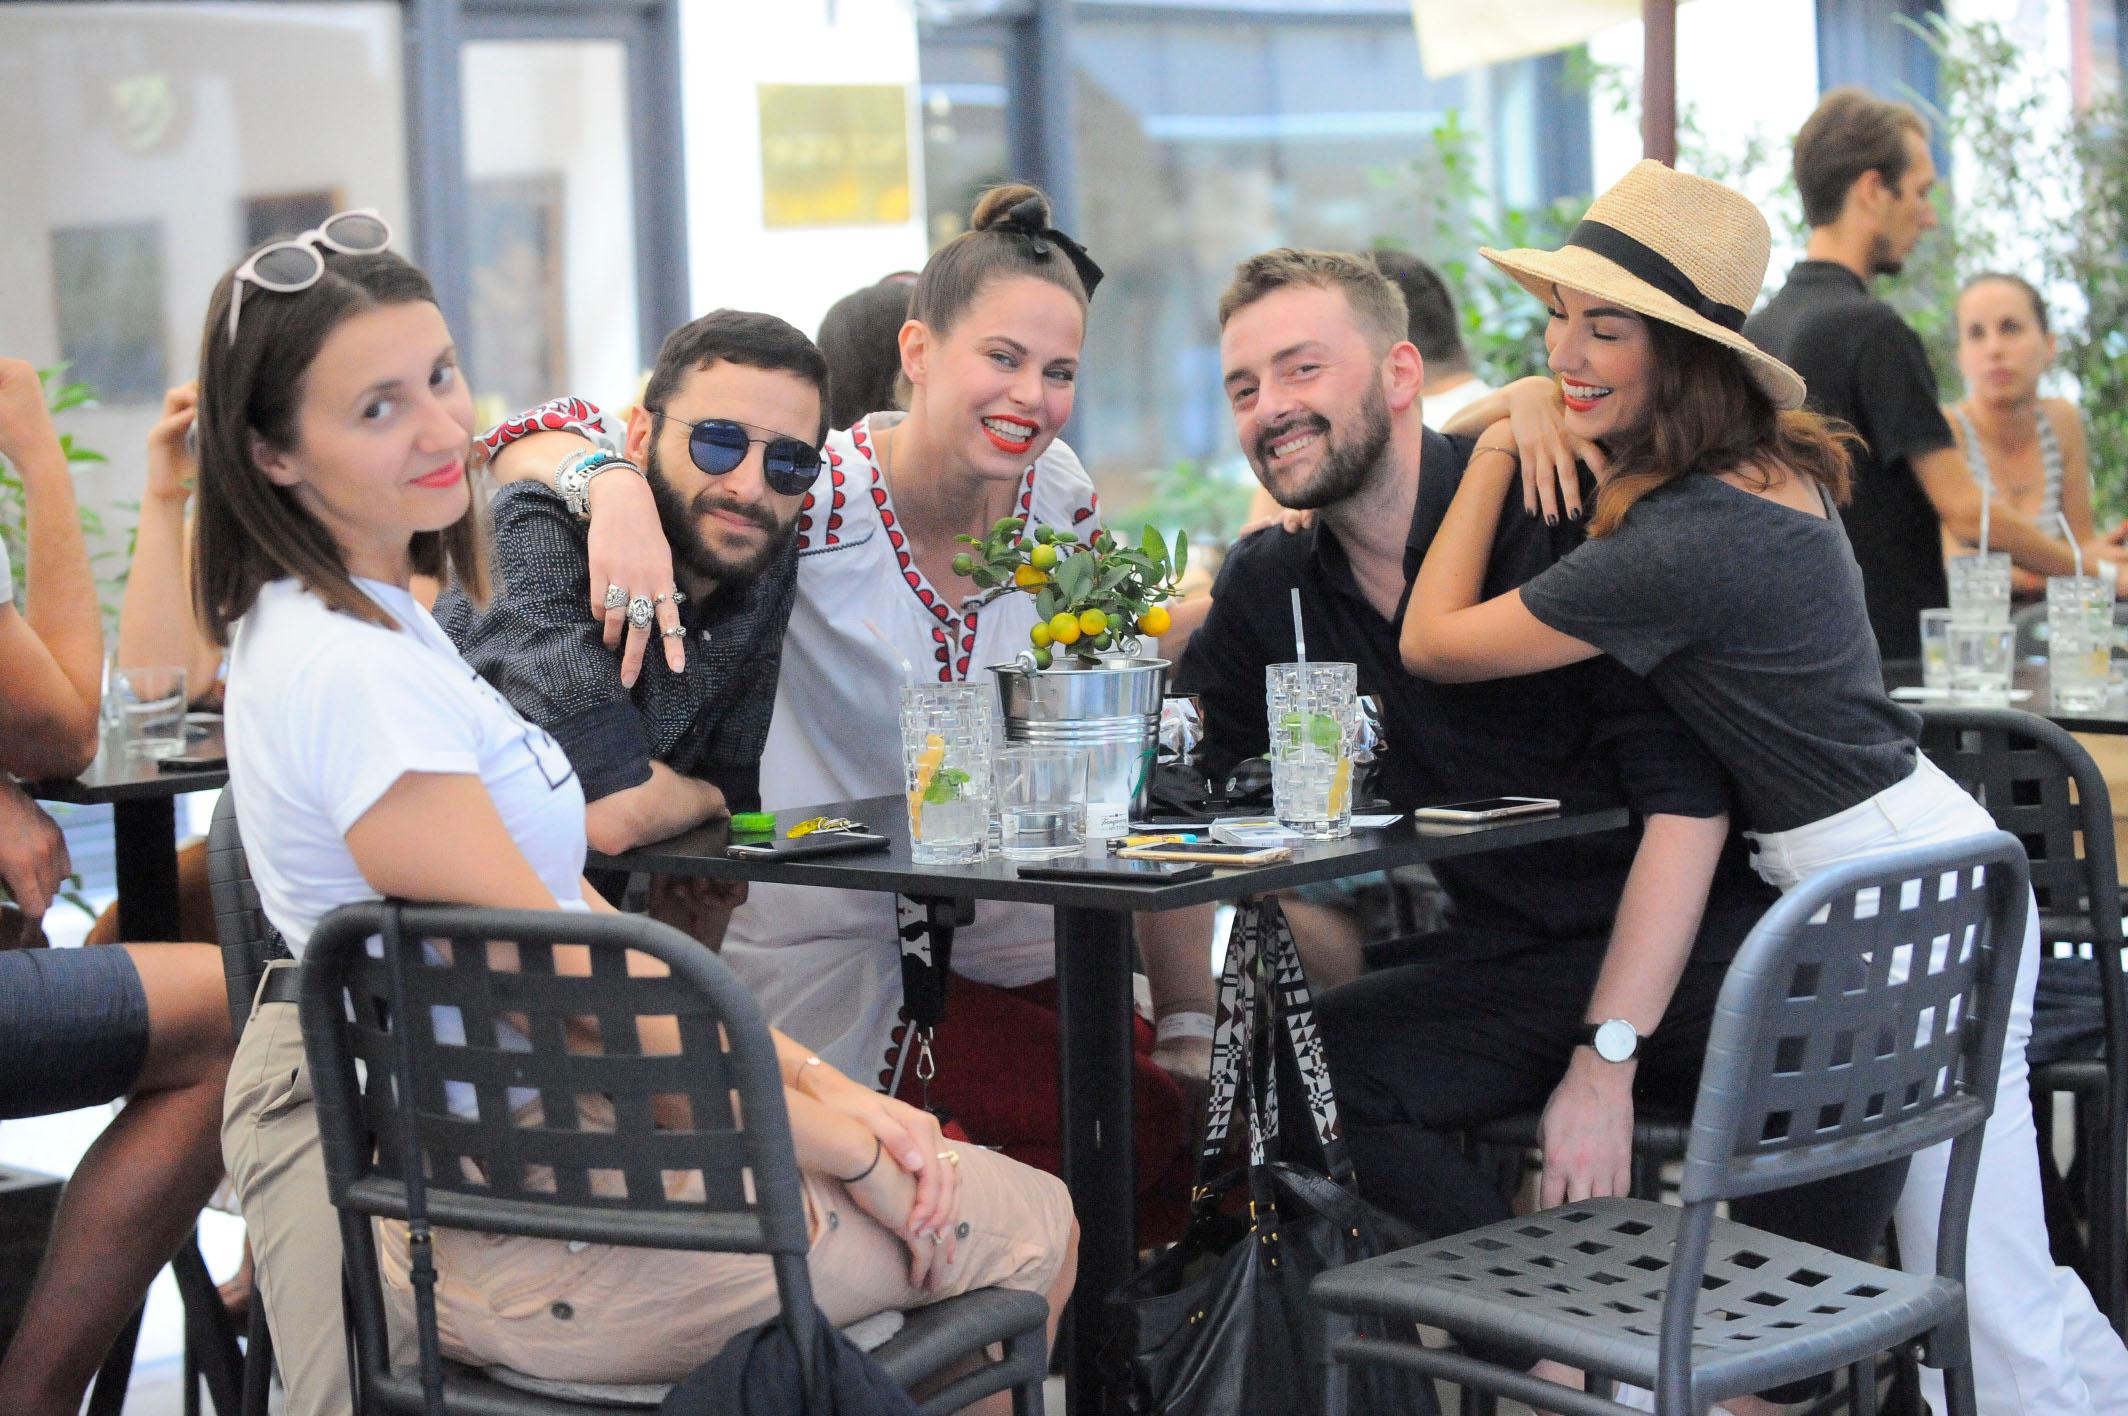 Spica / Zagreb 18.06.2018. / foto: Maja Jurovic / Vjeko Franetovic (Envy Room) i Nikica Ivancevic (Envy Room) i Mia Kovacic i Tatjana Juric